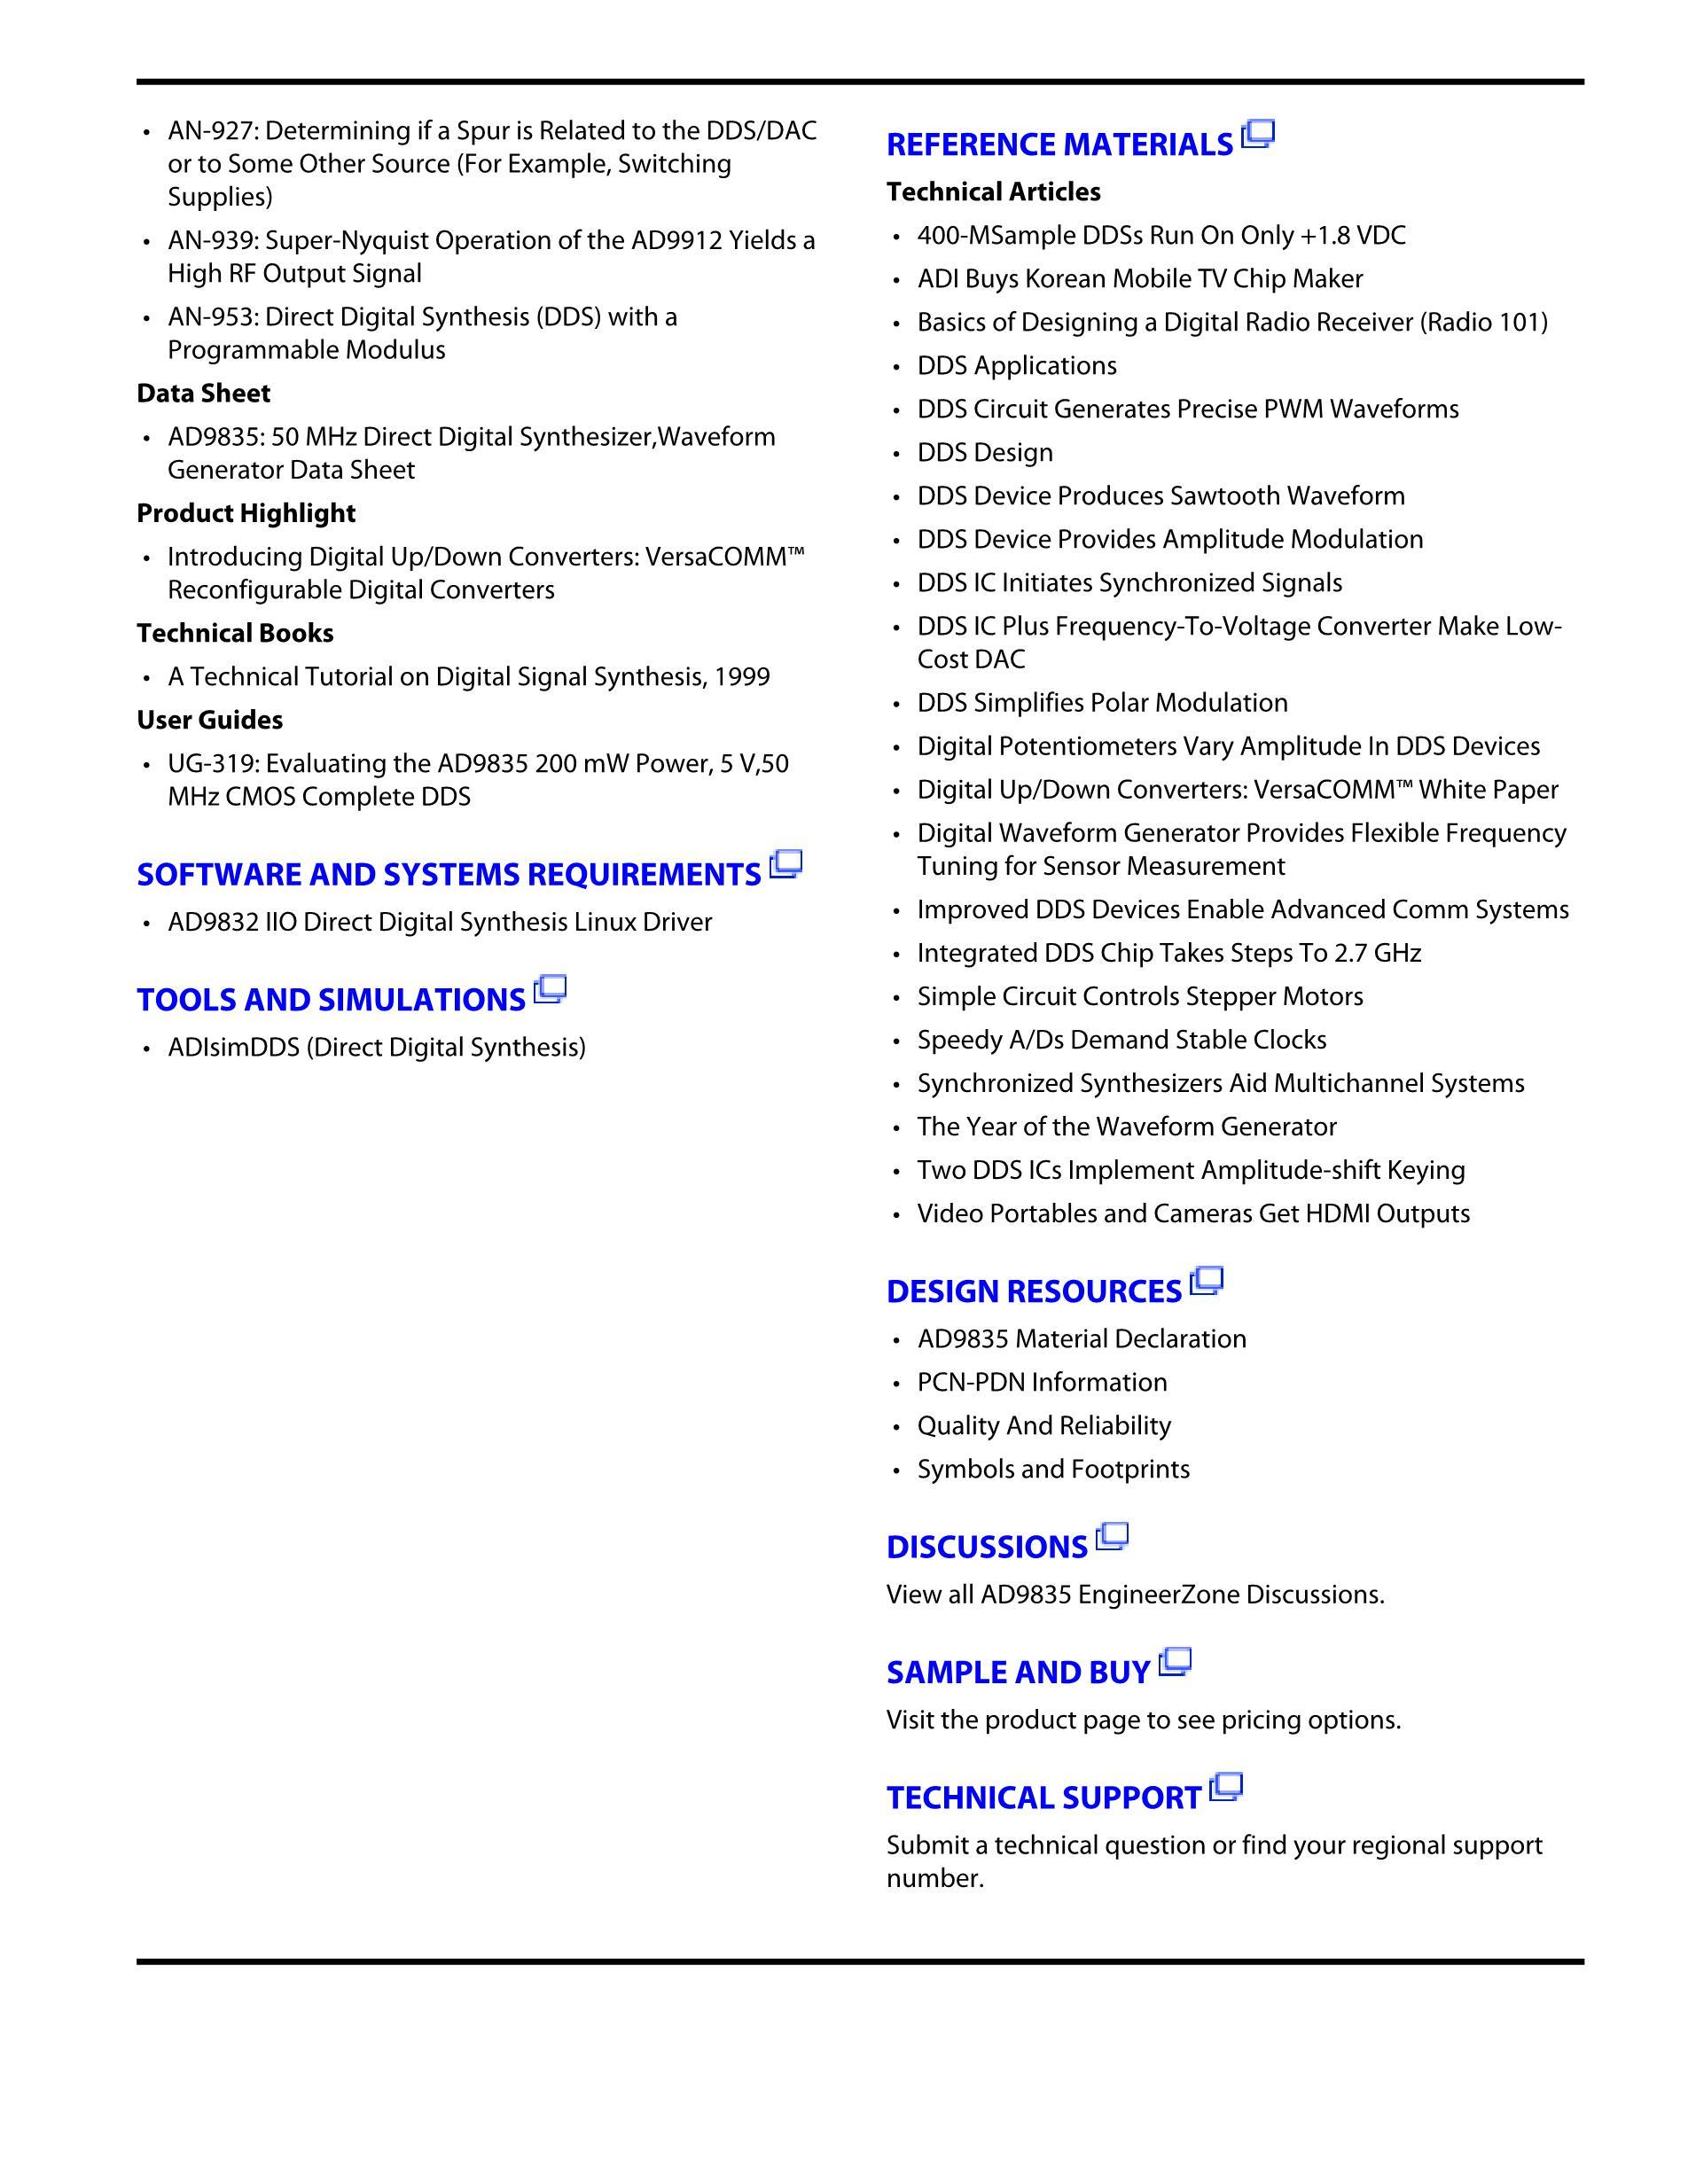 AD9835BRUZ's pdf picture 3